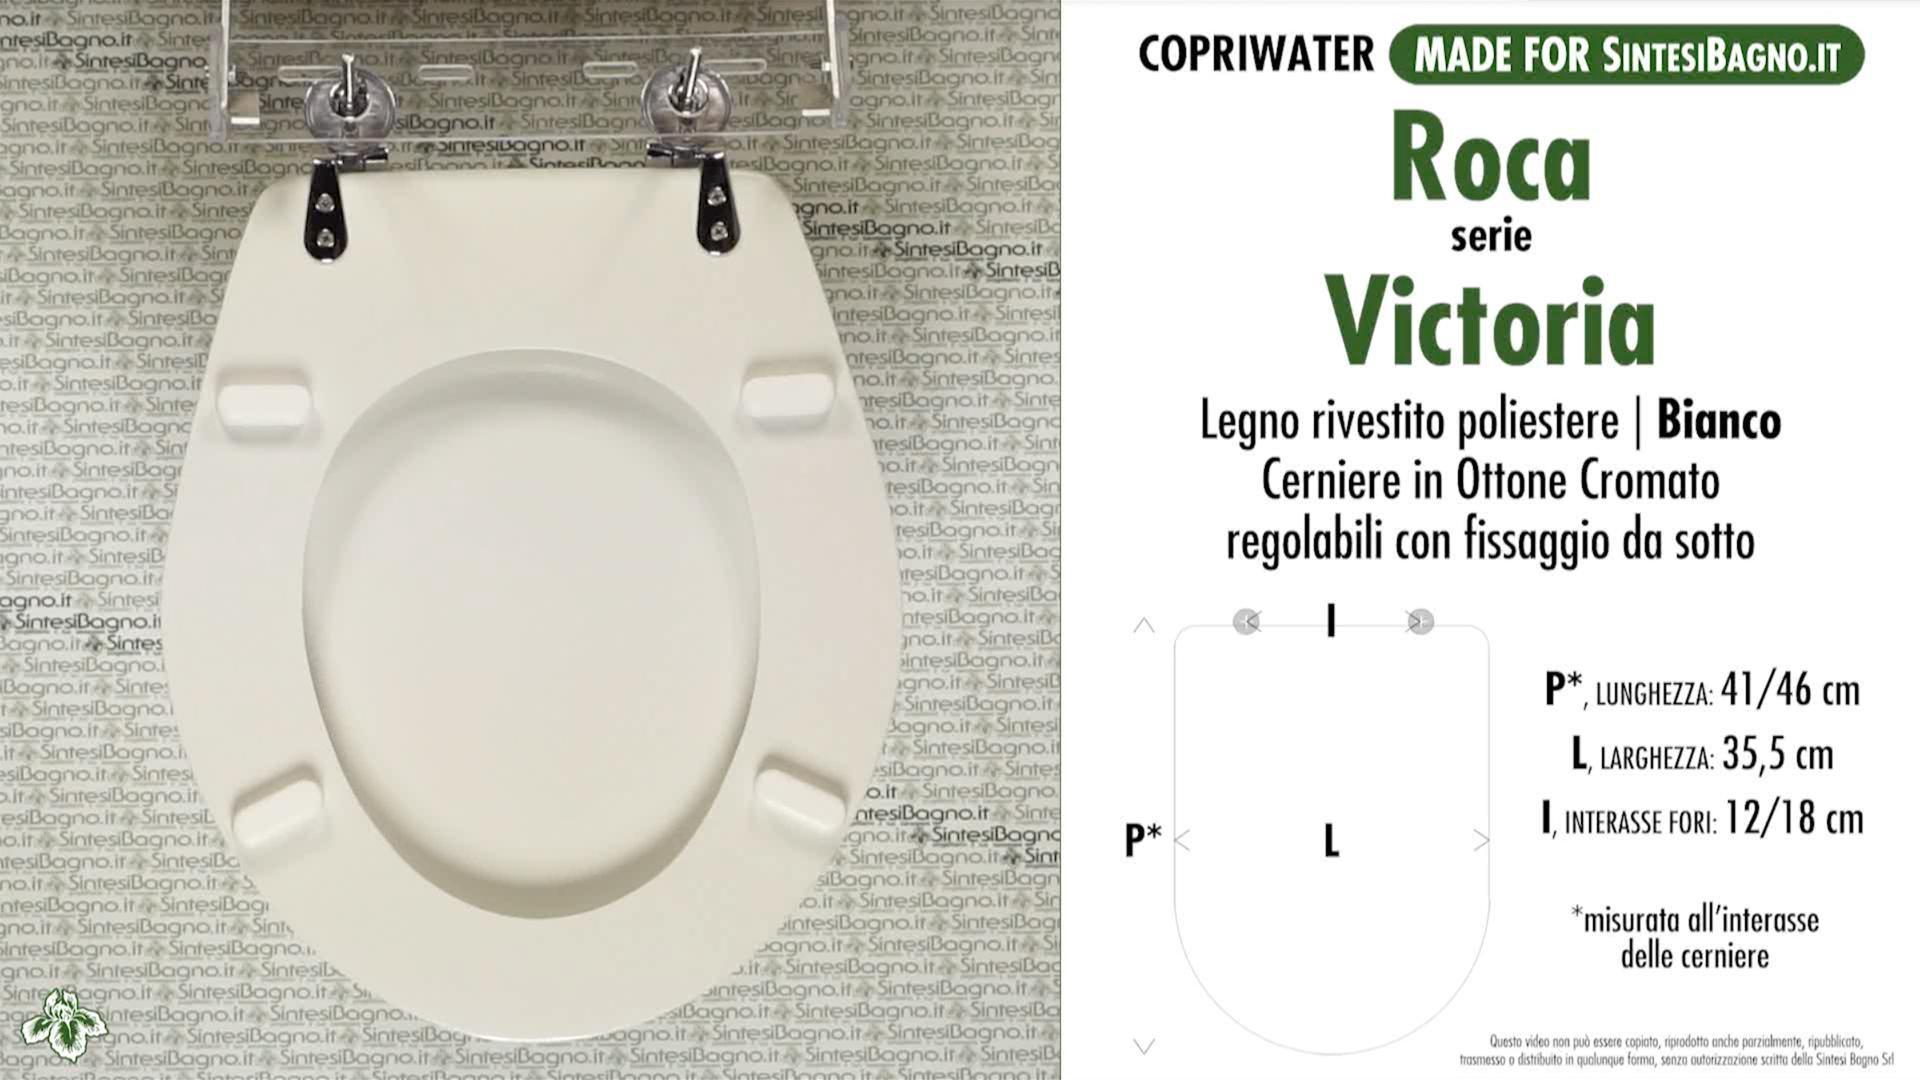 SCHEDA TECNICA MISURE copriwater ROCA VICTORIA